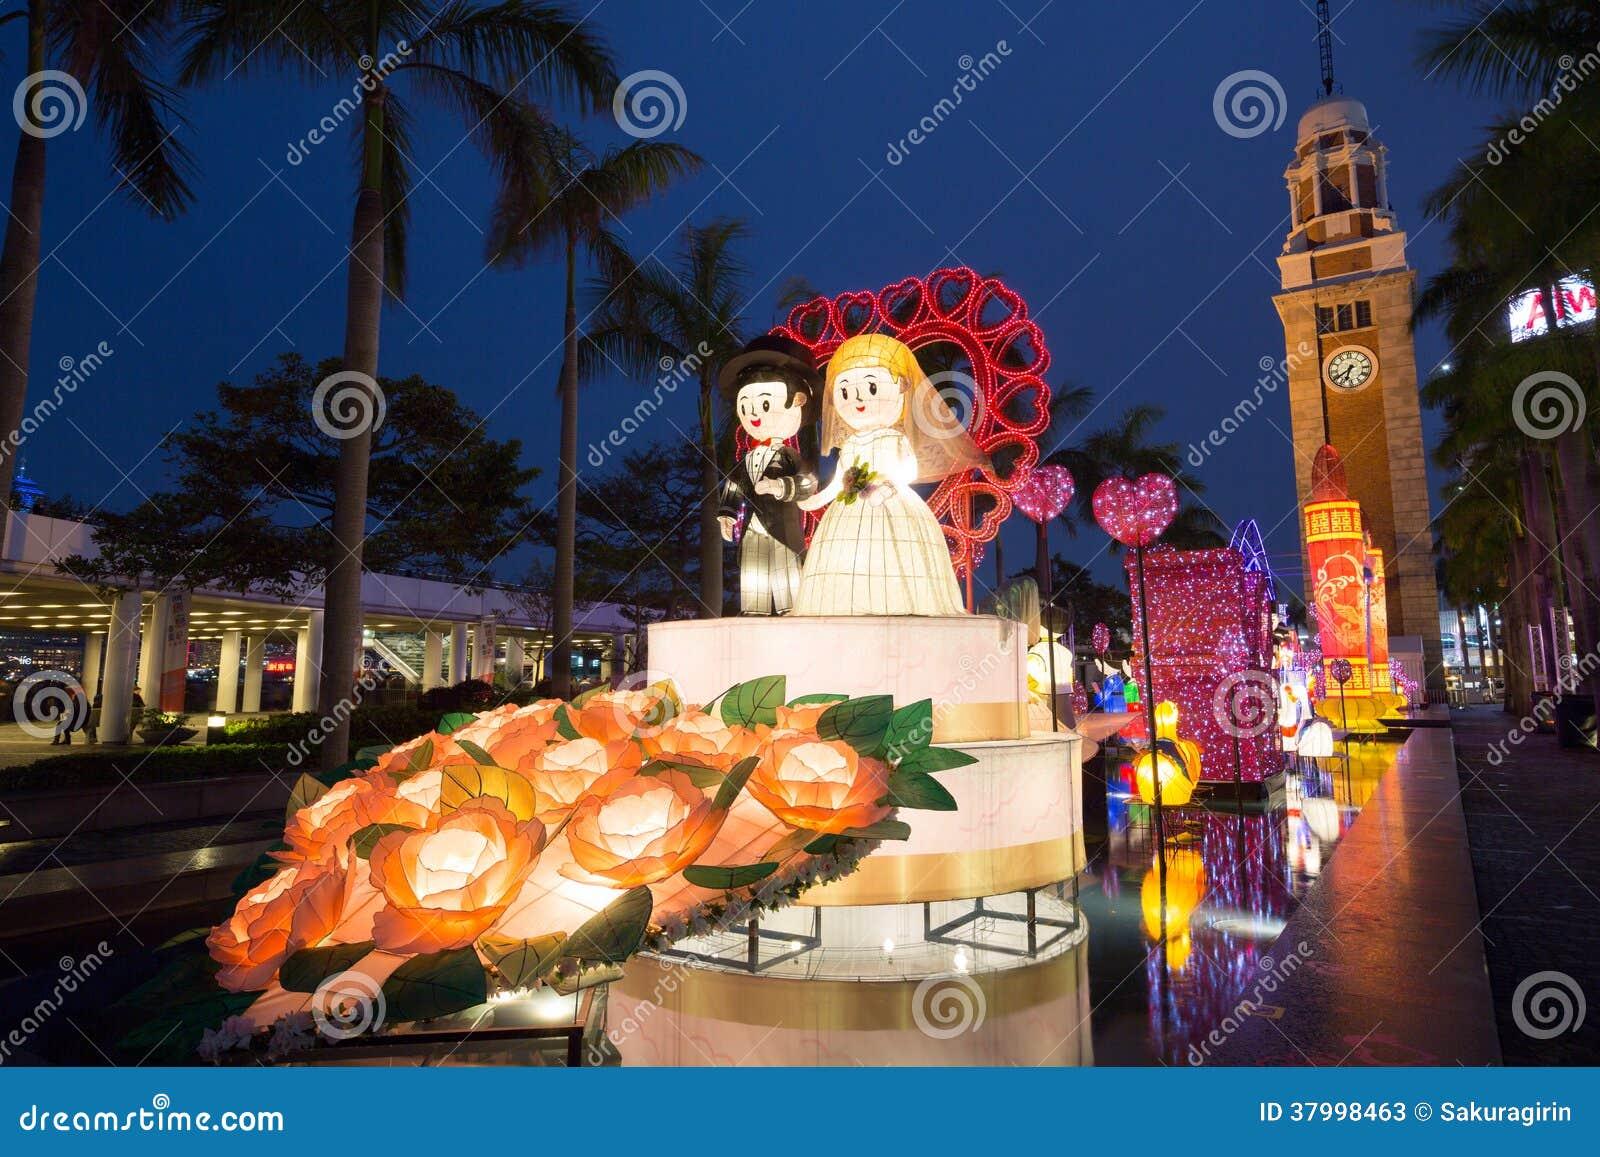 festival de linterna de la primavera en hong kong foto de archivo editorial